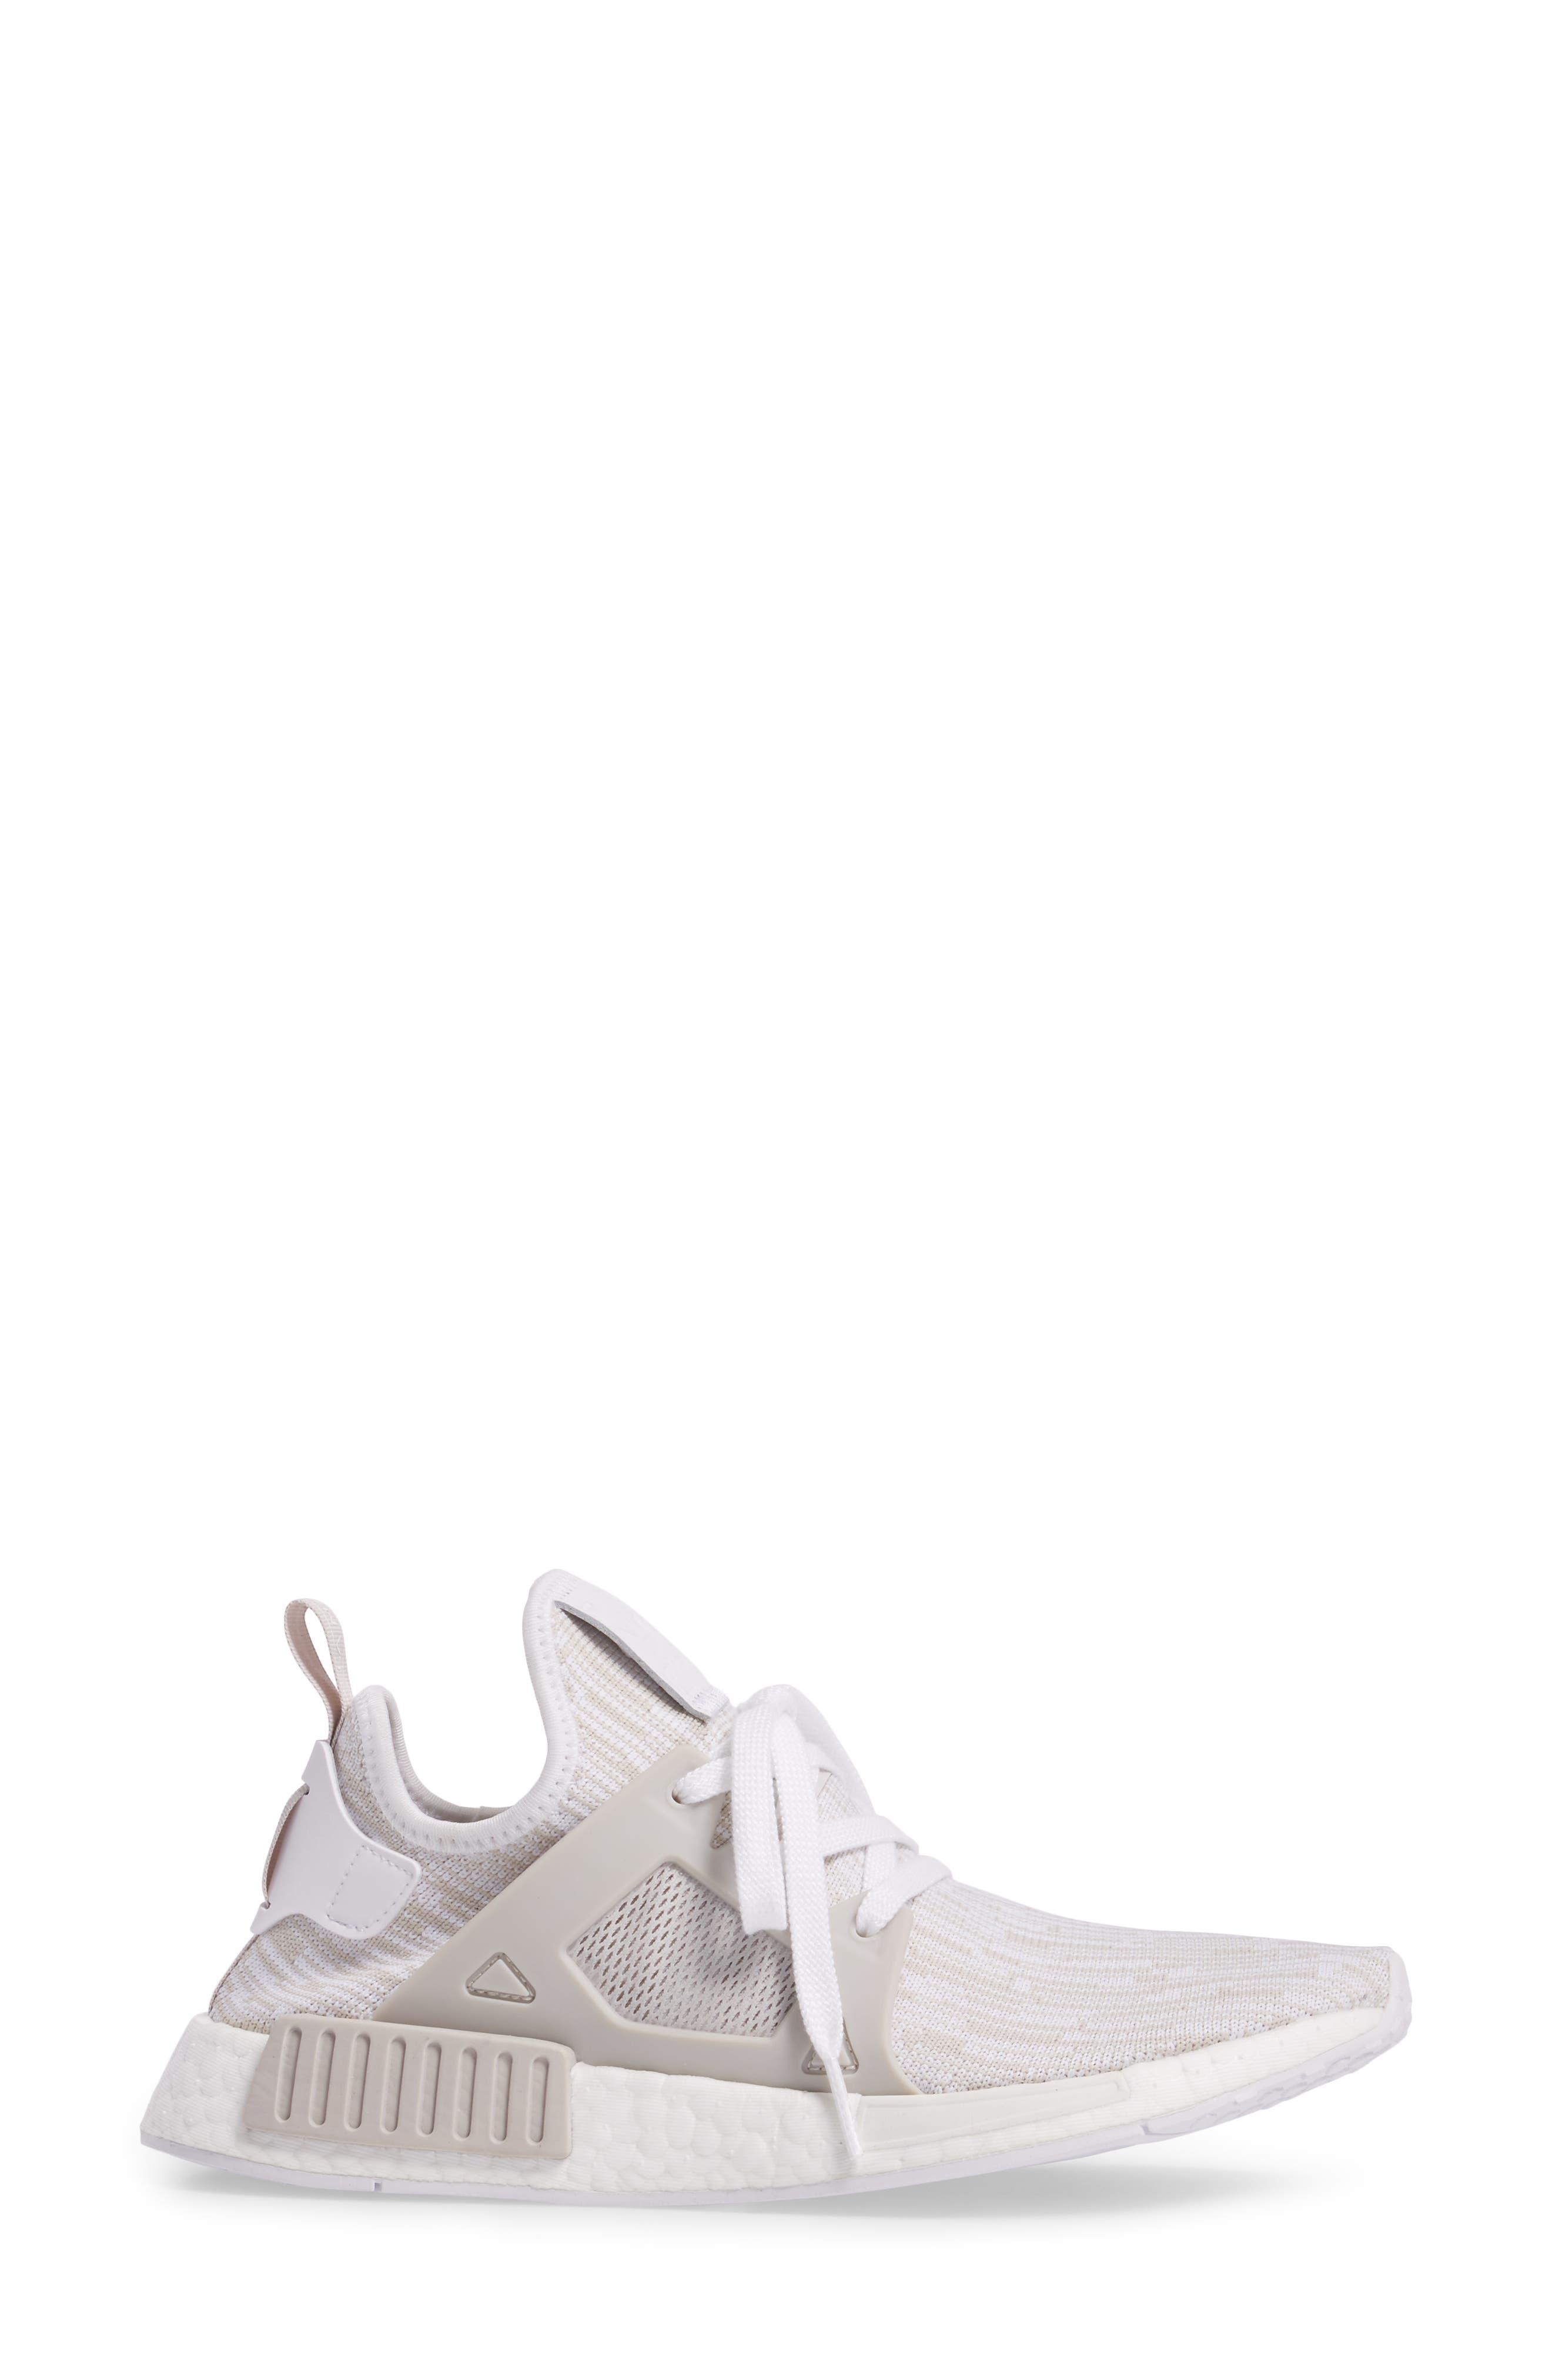 Alternate Image 3  - adidas NMD XR1 Athletic Shoe (Women)